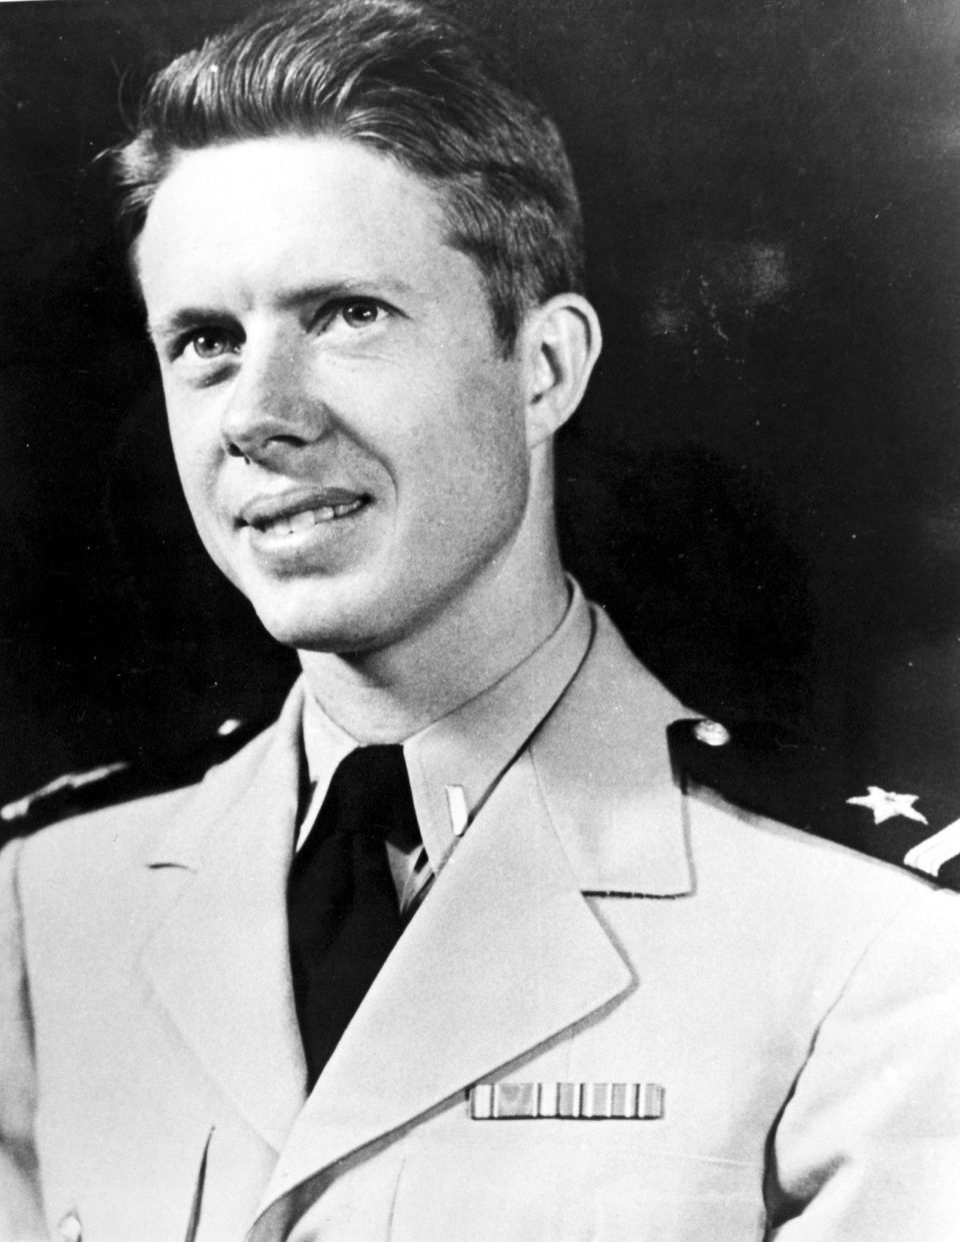 Jimmy(James Earl) Carter as Ensign, USN, circa World War II.